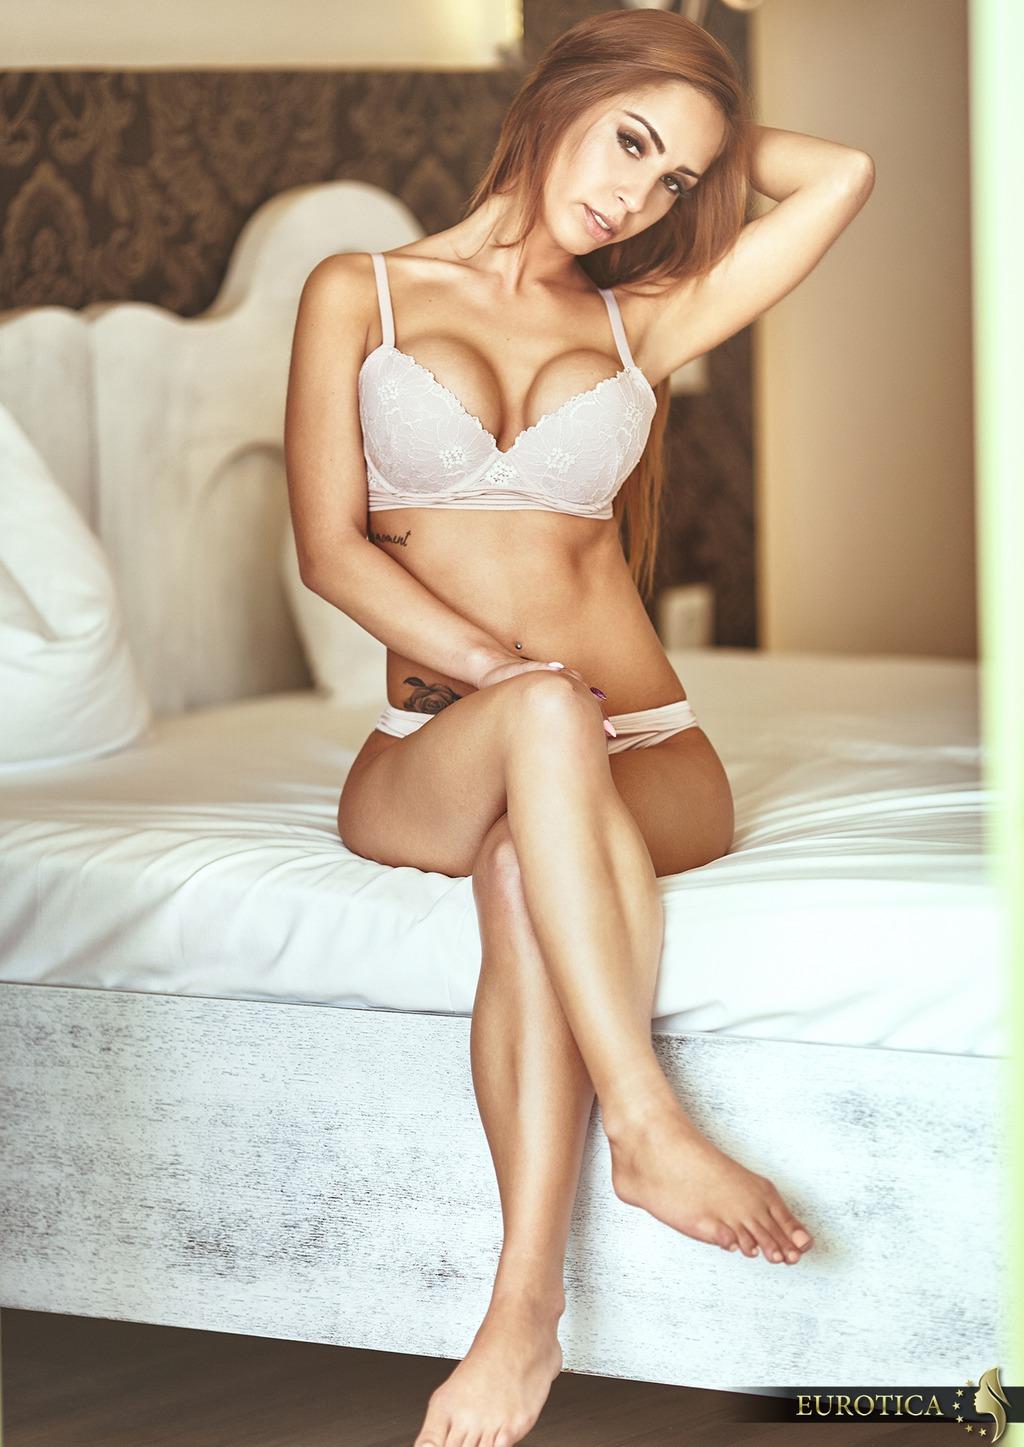 PHOTO | Vivienne 00 - Vivienne In The Bedroom